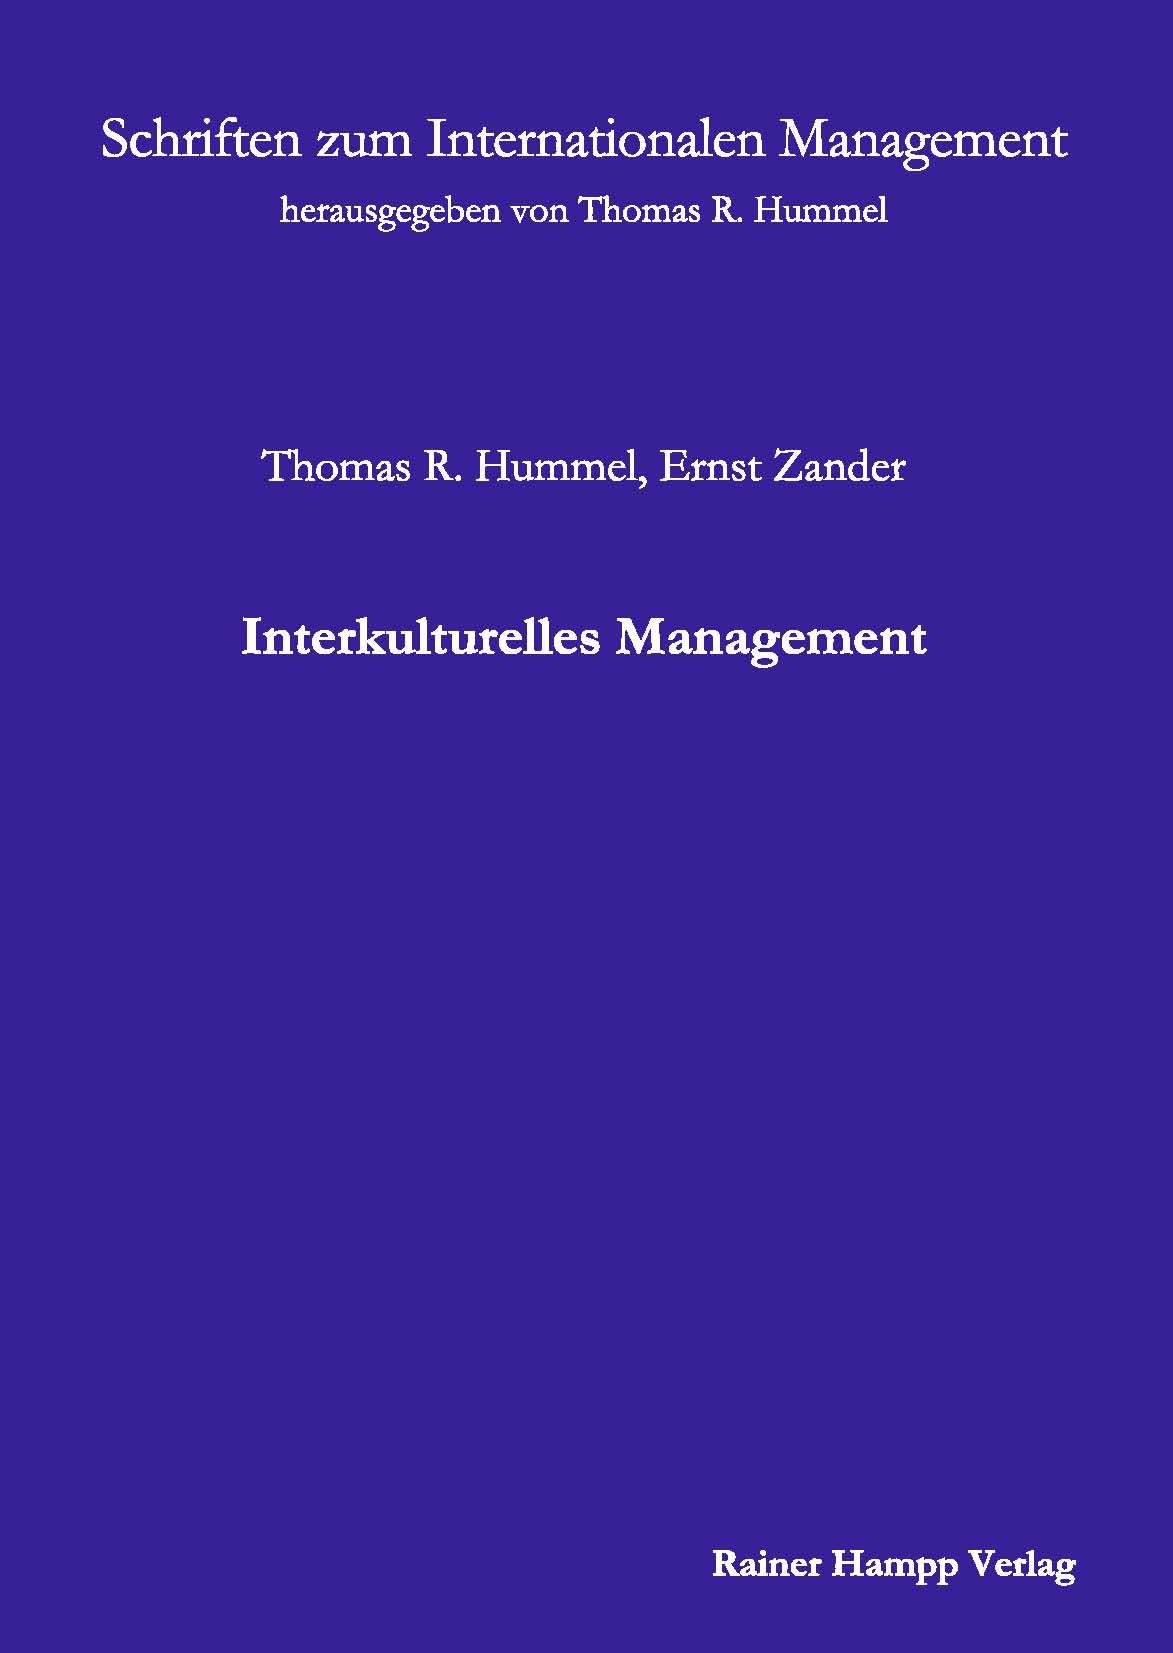 Interkulturelles Management - Thomas R. Hummel